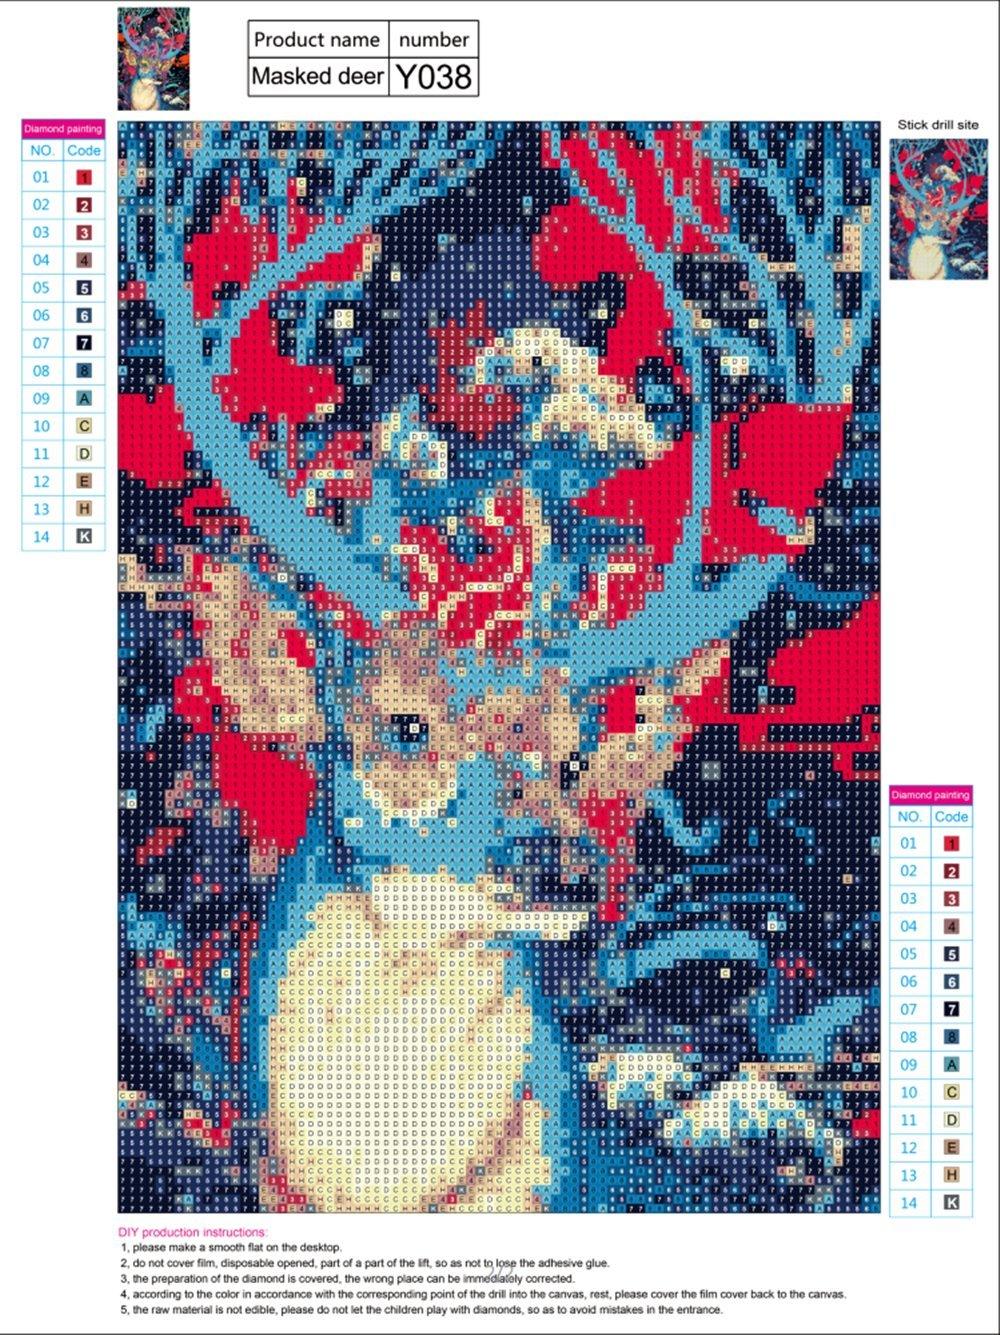 Better Selection Baby Panda Diamond Painting Number Kits Christmas Decorations Full Drill 5D DIY Arts /& Crafts Bling Artwork Decor Set Crystal Rhinestone Gems 12x16 30x40 cm